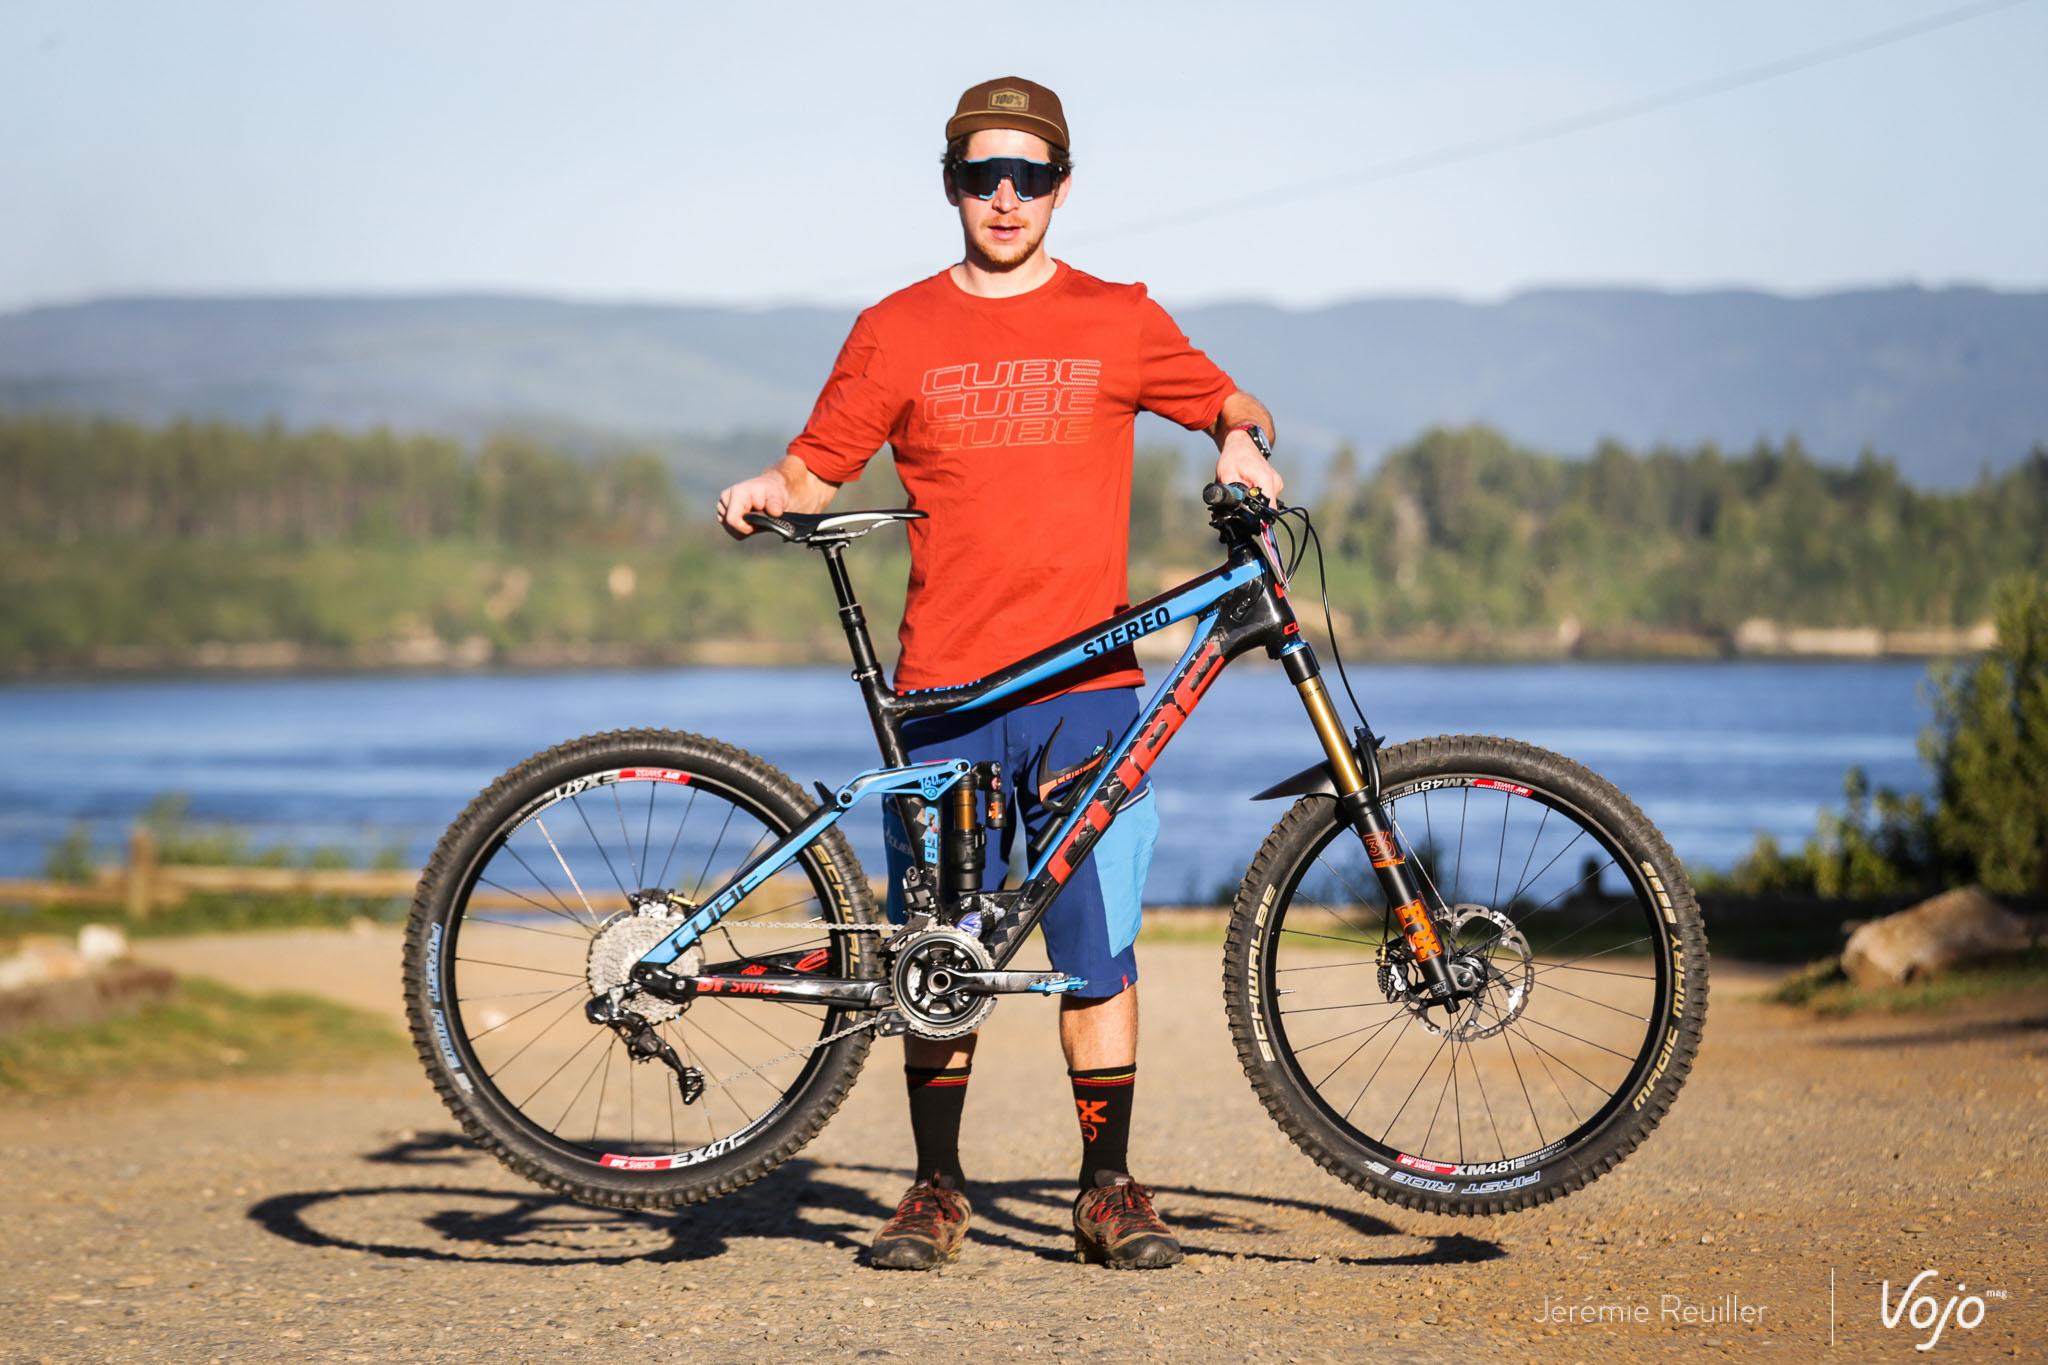 Bike_Check_EWS_Nicolas_Lau_Copyright_Reuiller_Vojomag-1